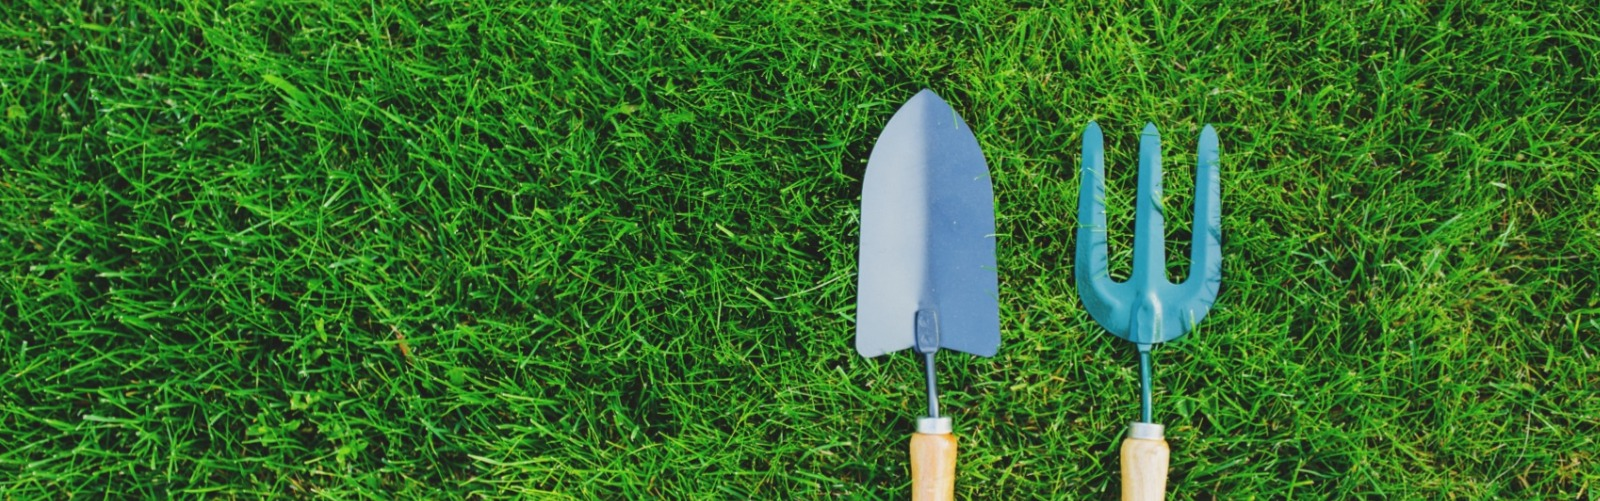 hickman landscaping landscapers burford witney oxfordshire soft  hard  fencing  timber  garden